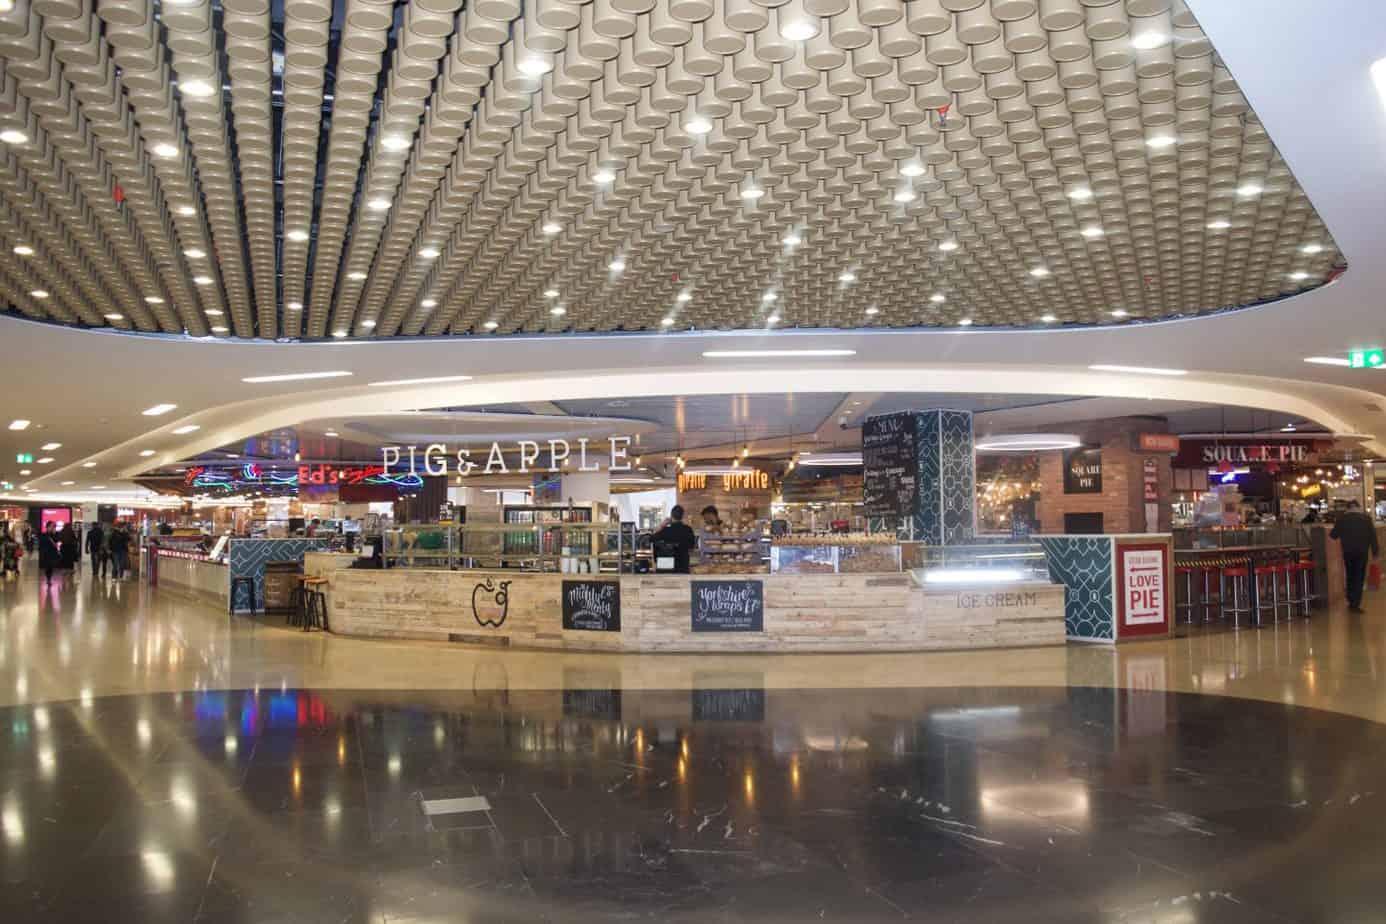 Grand Central Station Birmingham shops and restaurants